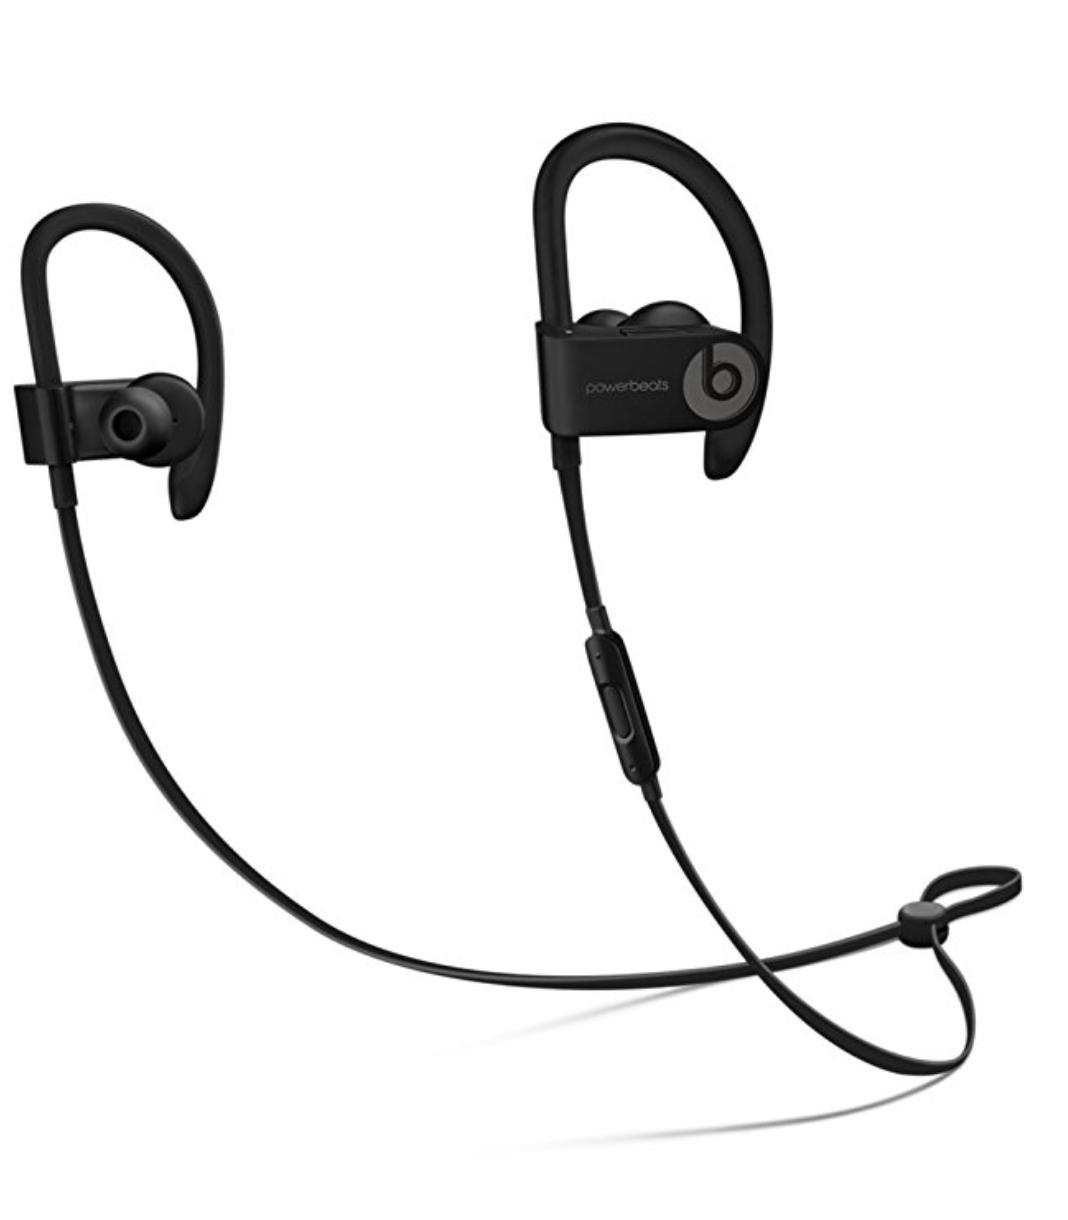 Beats Wireless Headphones - $79